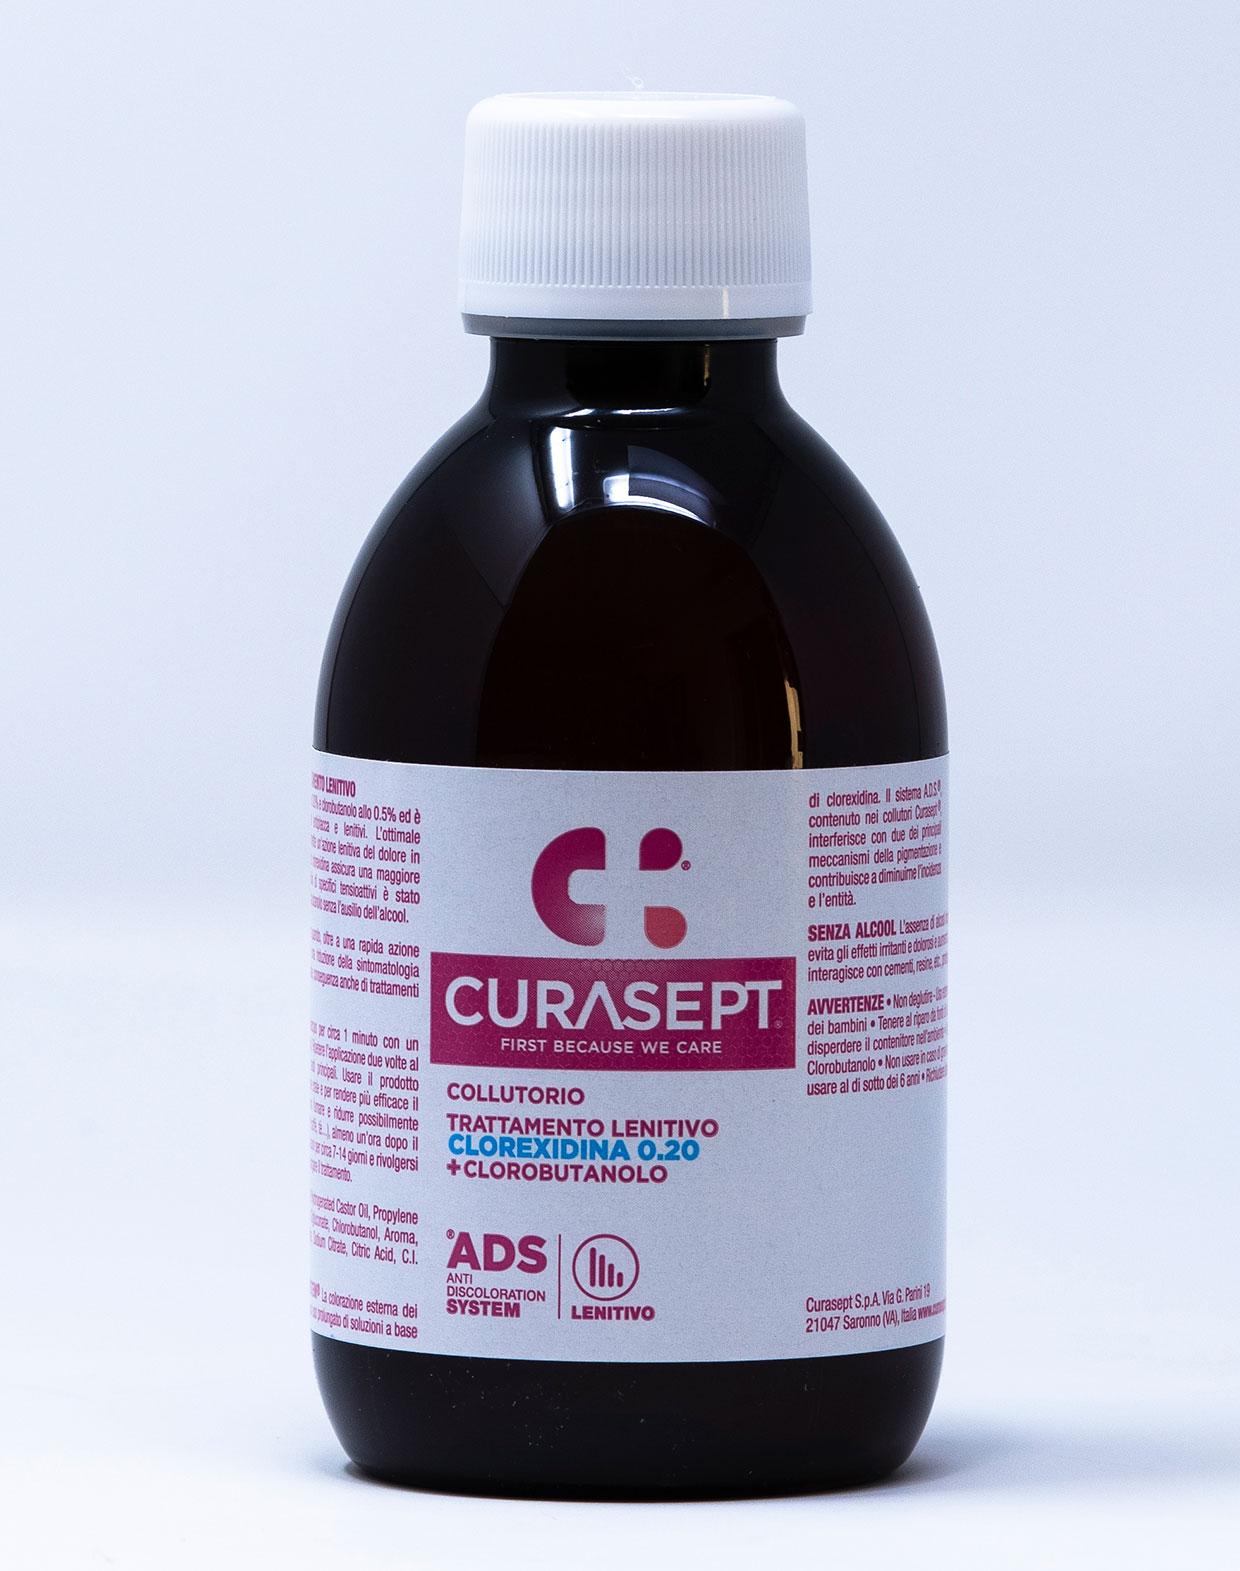 Curasept Collutorio ADS Trattamento Lenitivo 0,20% Con Clorobutanolo  - 200 ml